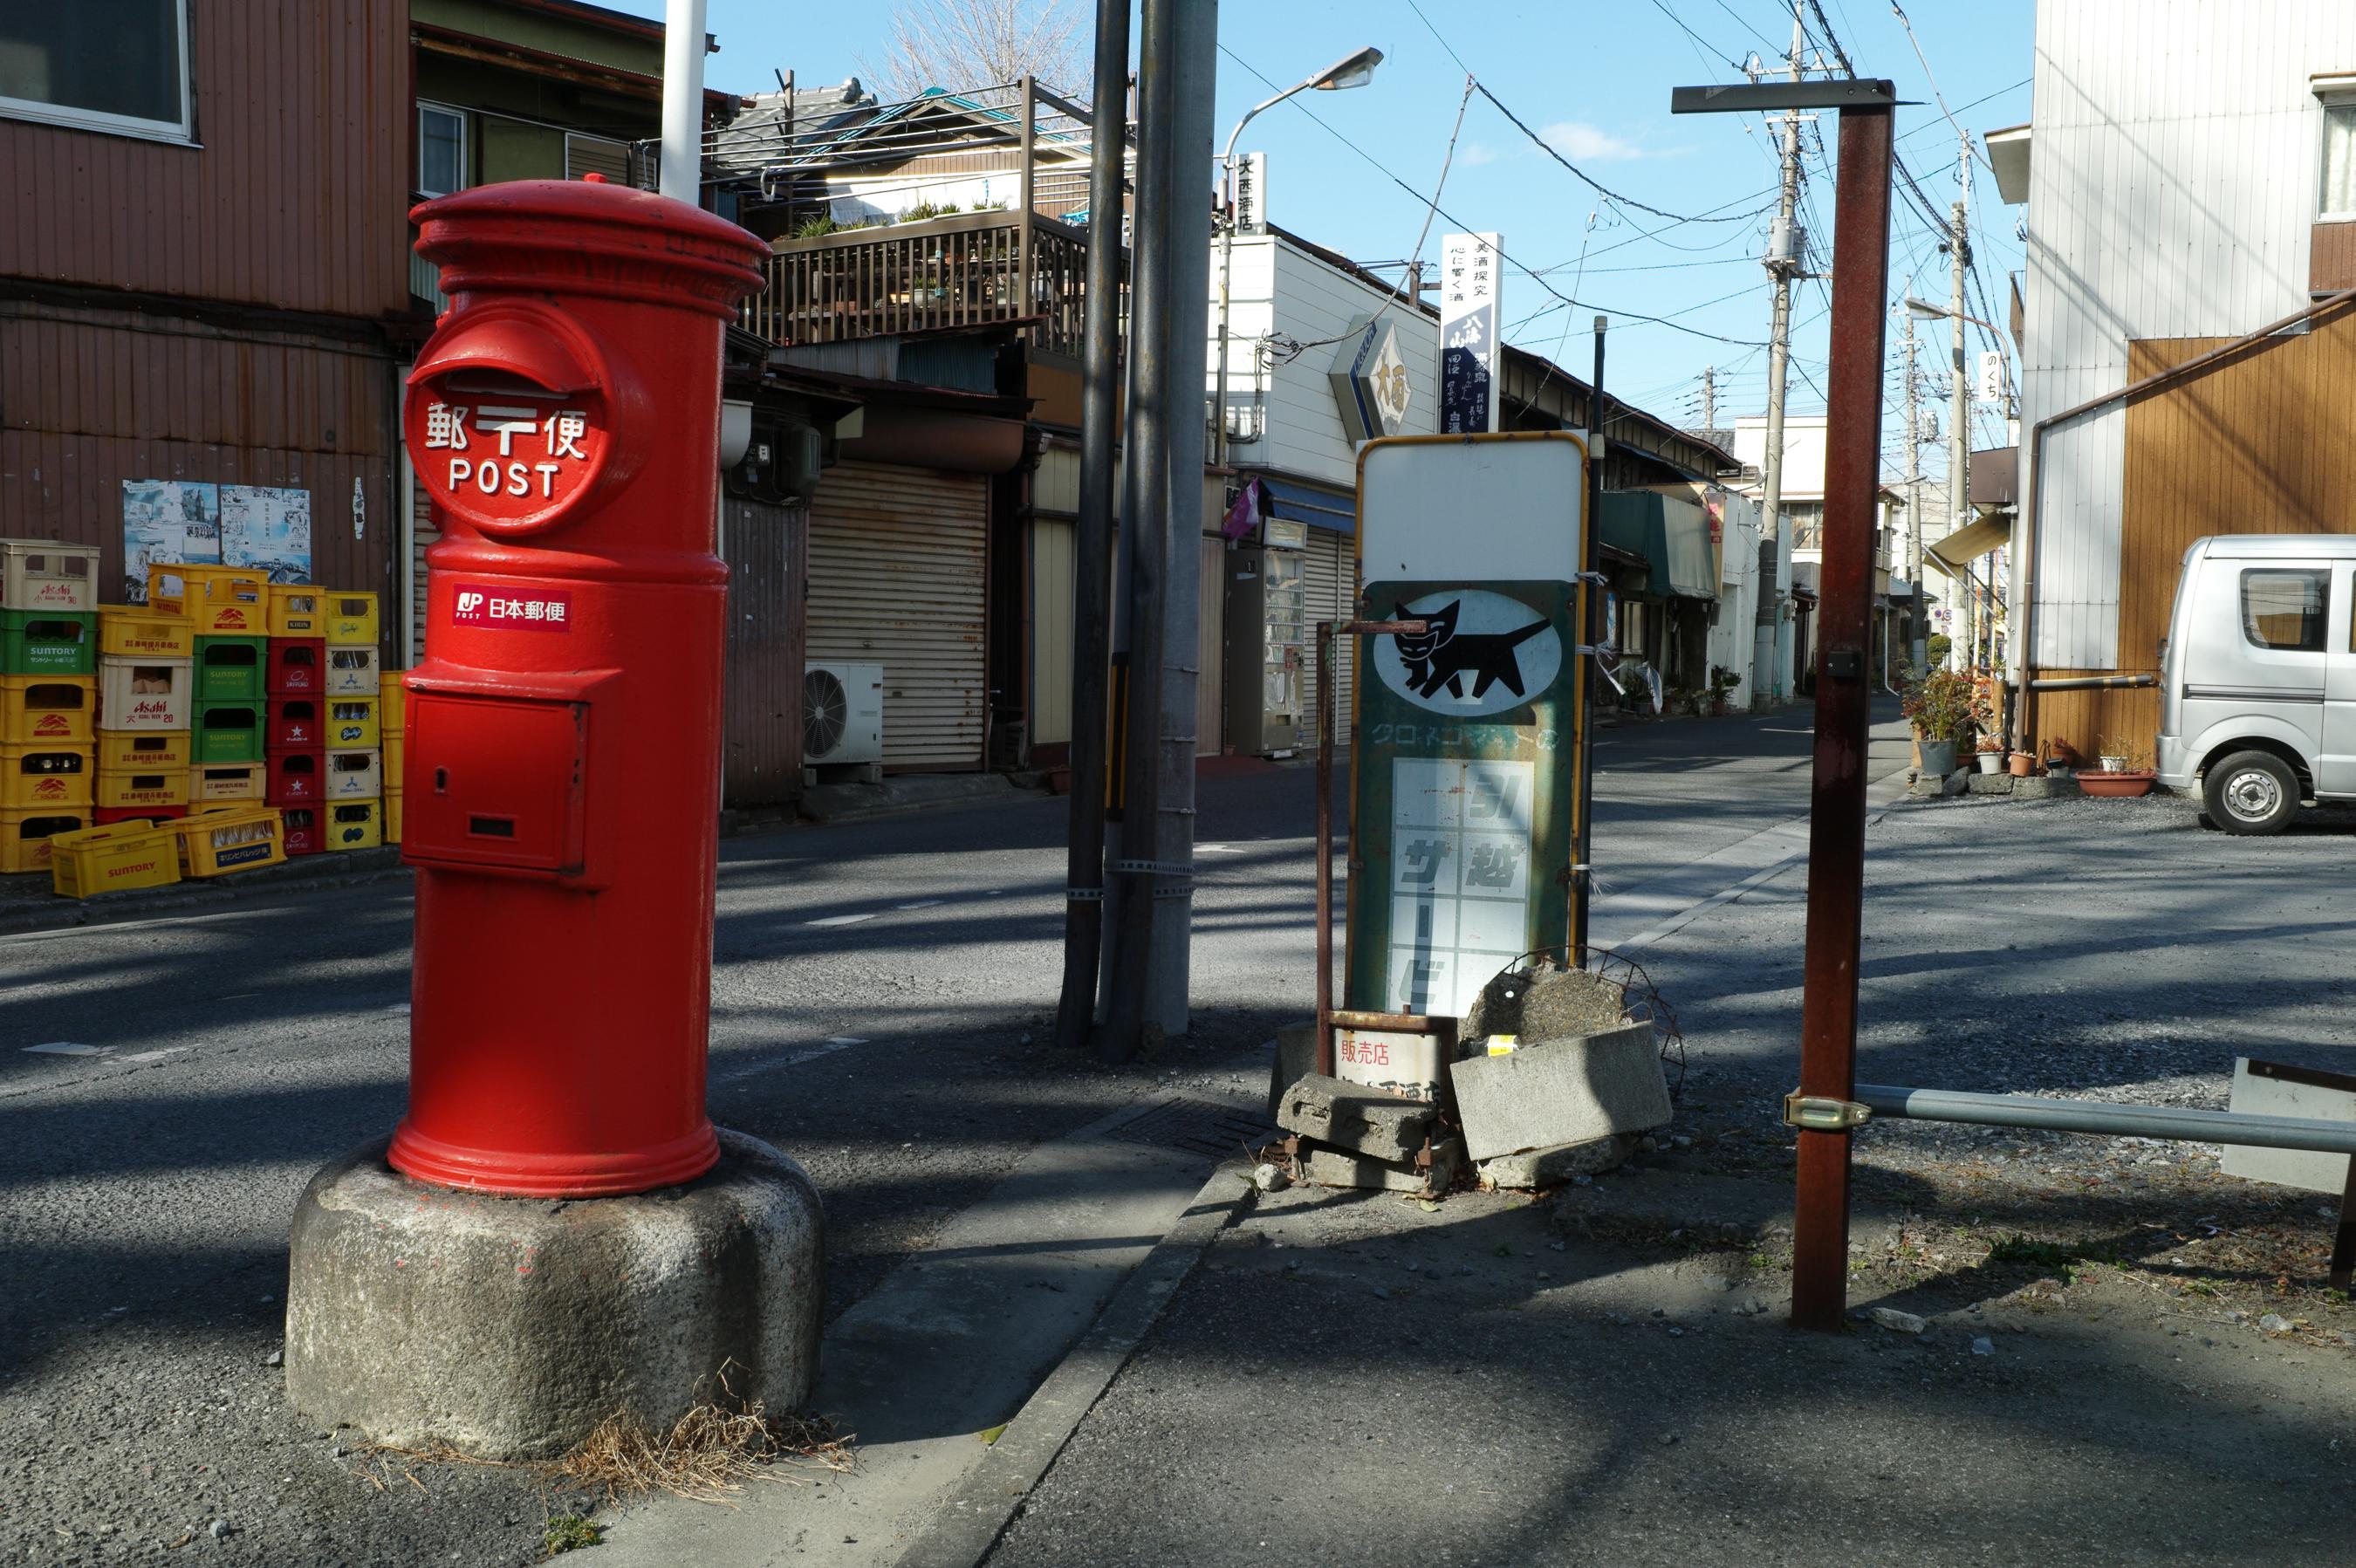 f:id:aoyama-takuro:20180211222249j:plain